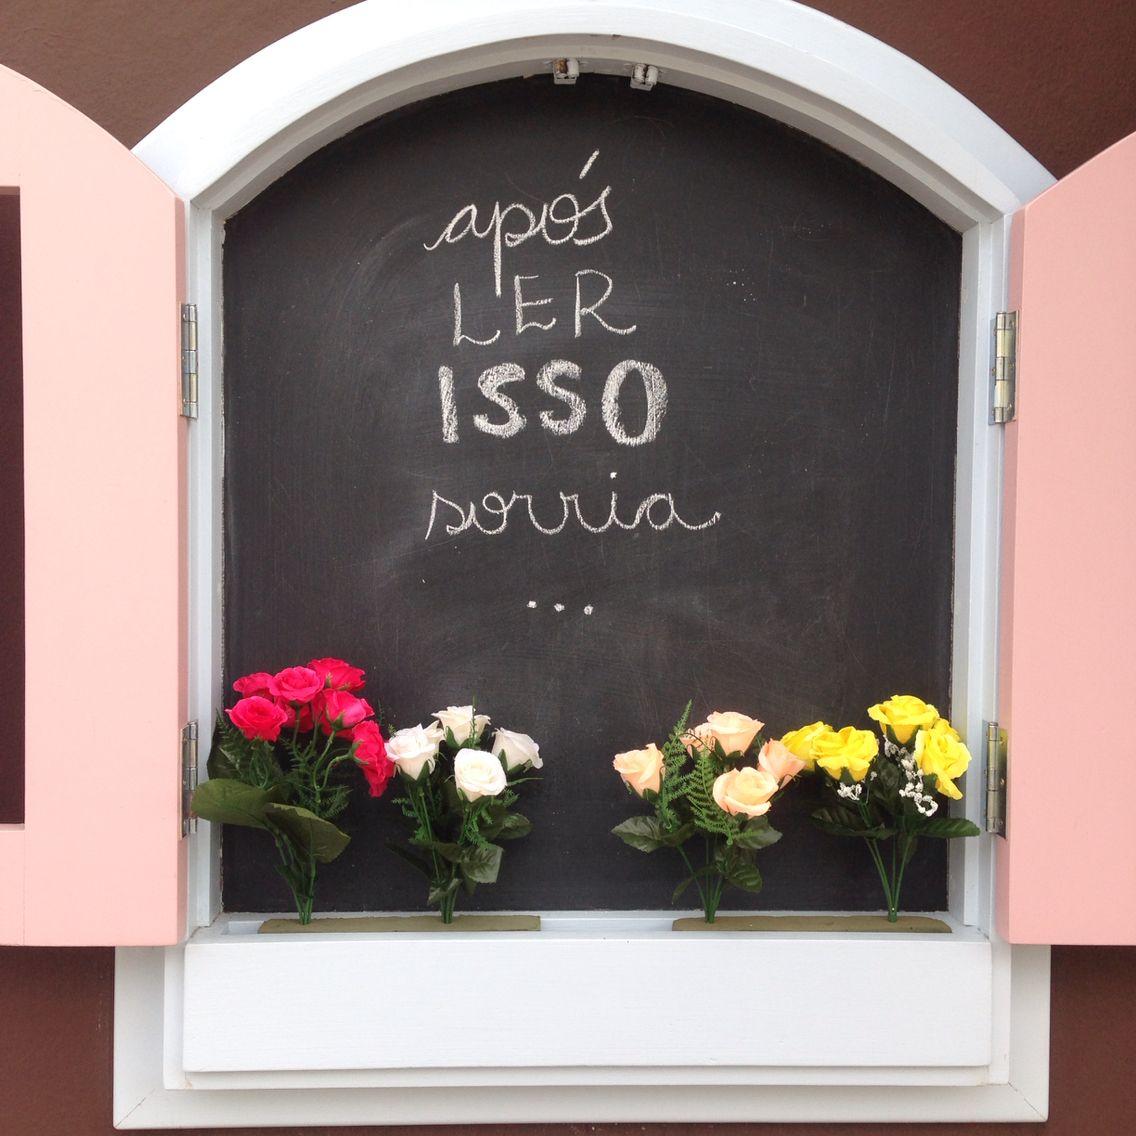 vejo flores e sorrisos BOM DIA #janelaamei #lojaamei #sorrisos #bomdia #amor #flores